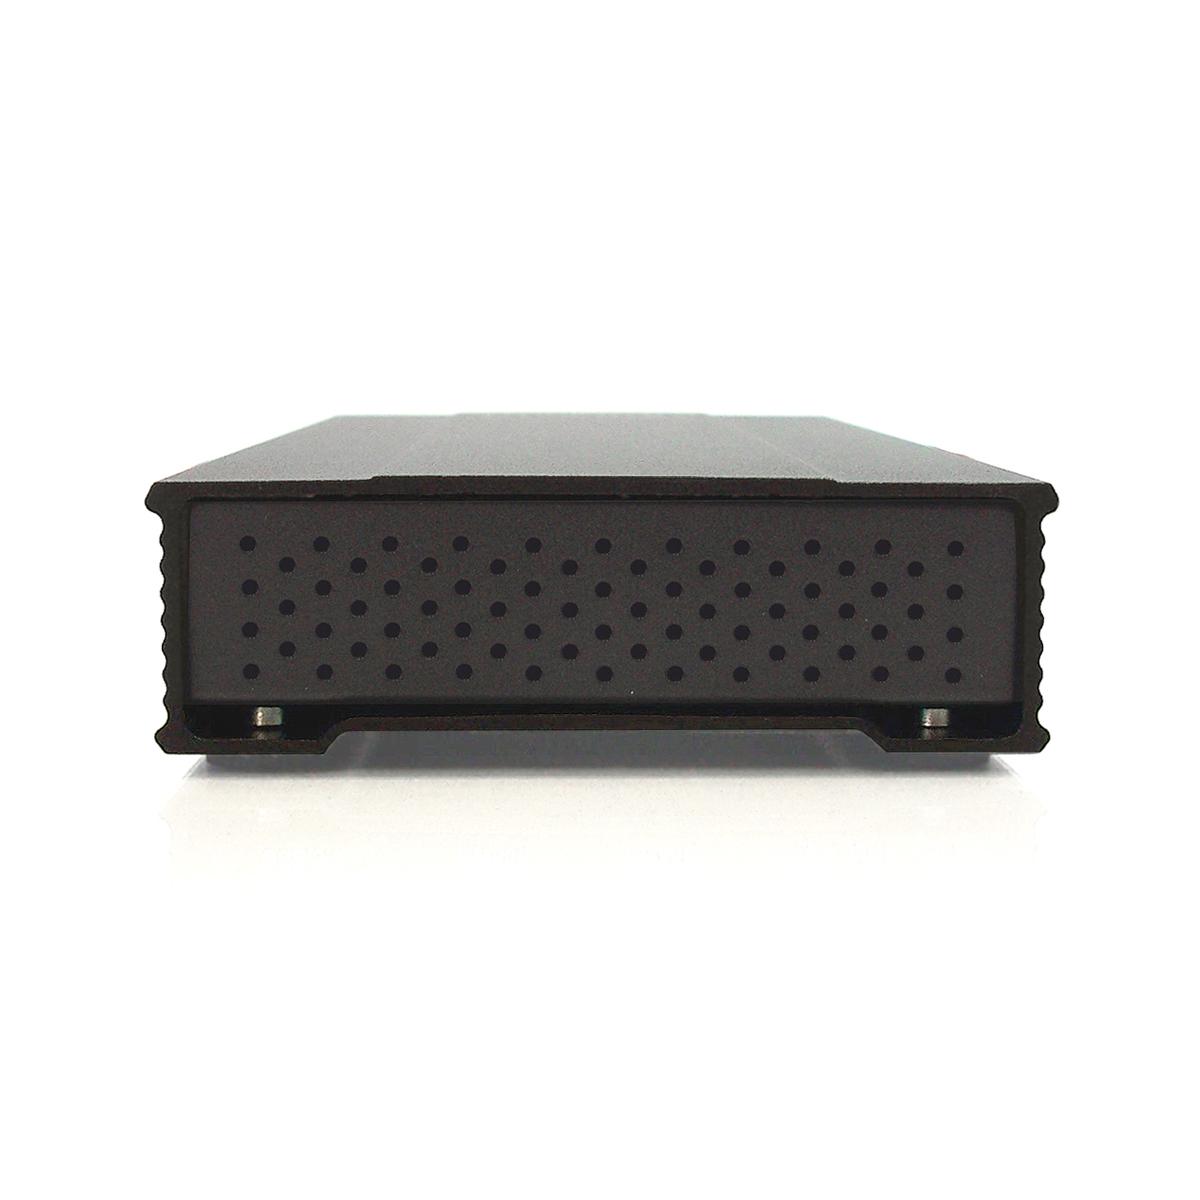 Oyen Digital: MiniPro 250GB FireWire 800, USB 3.0 Portable Solid ...